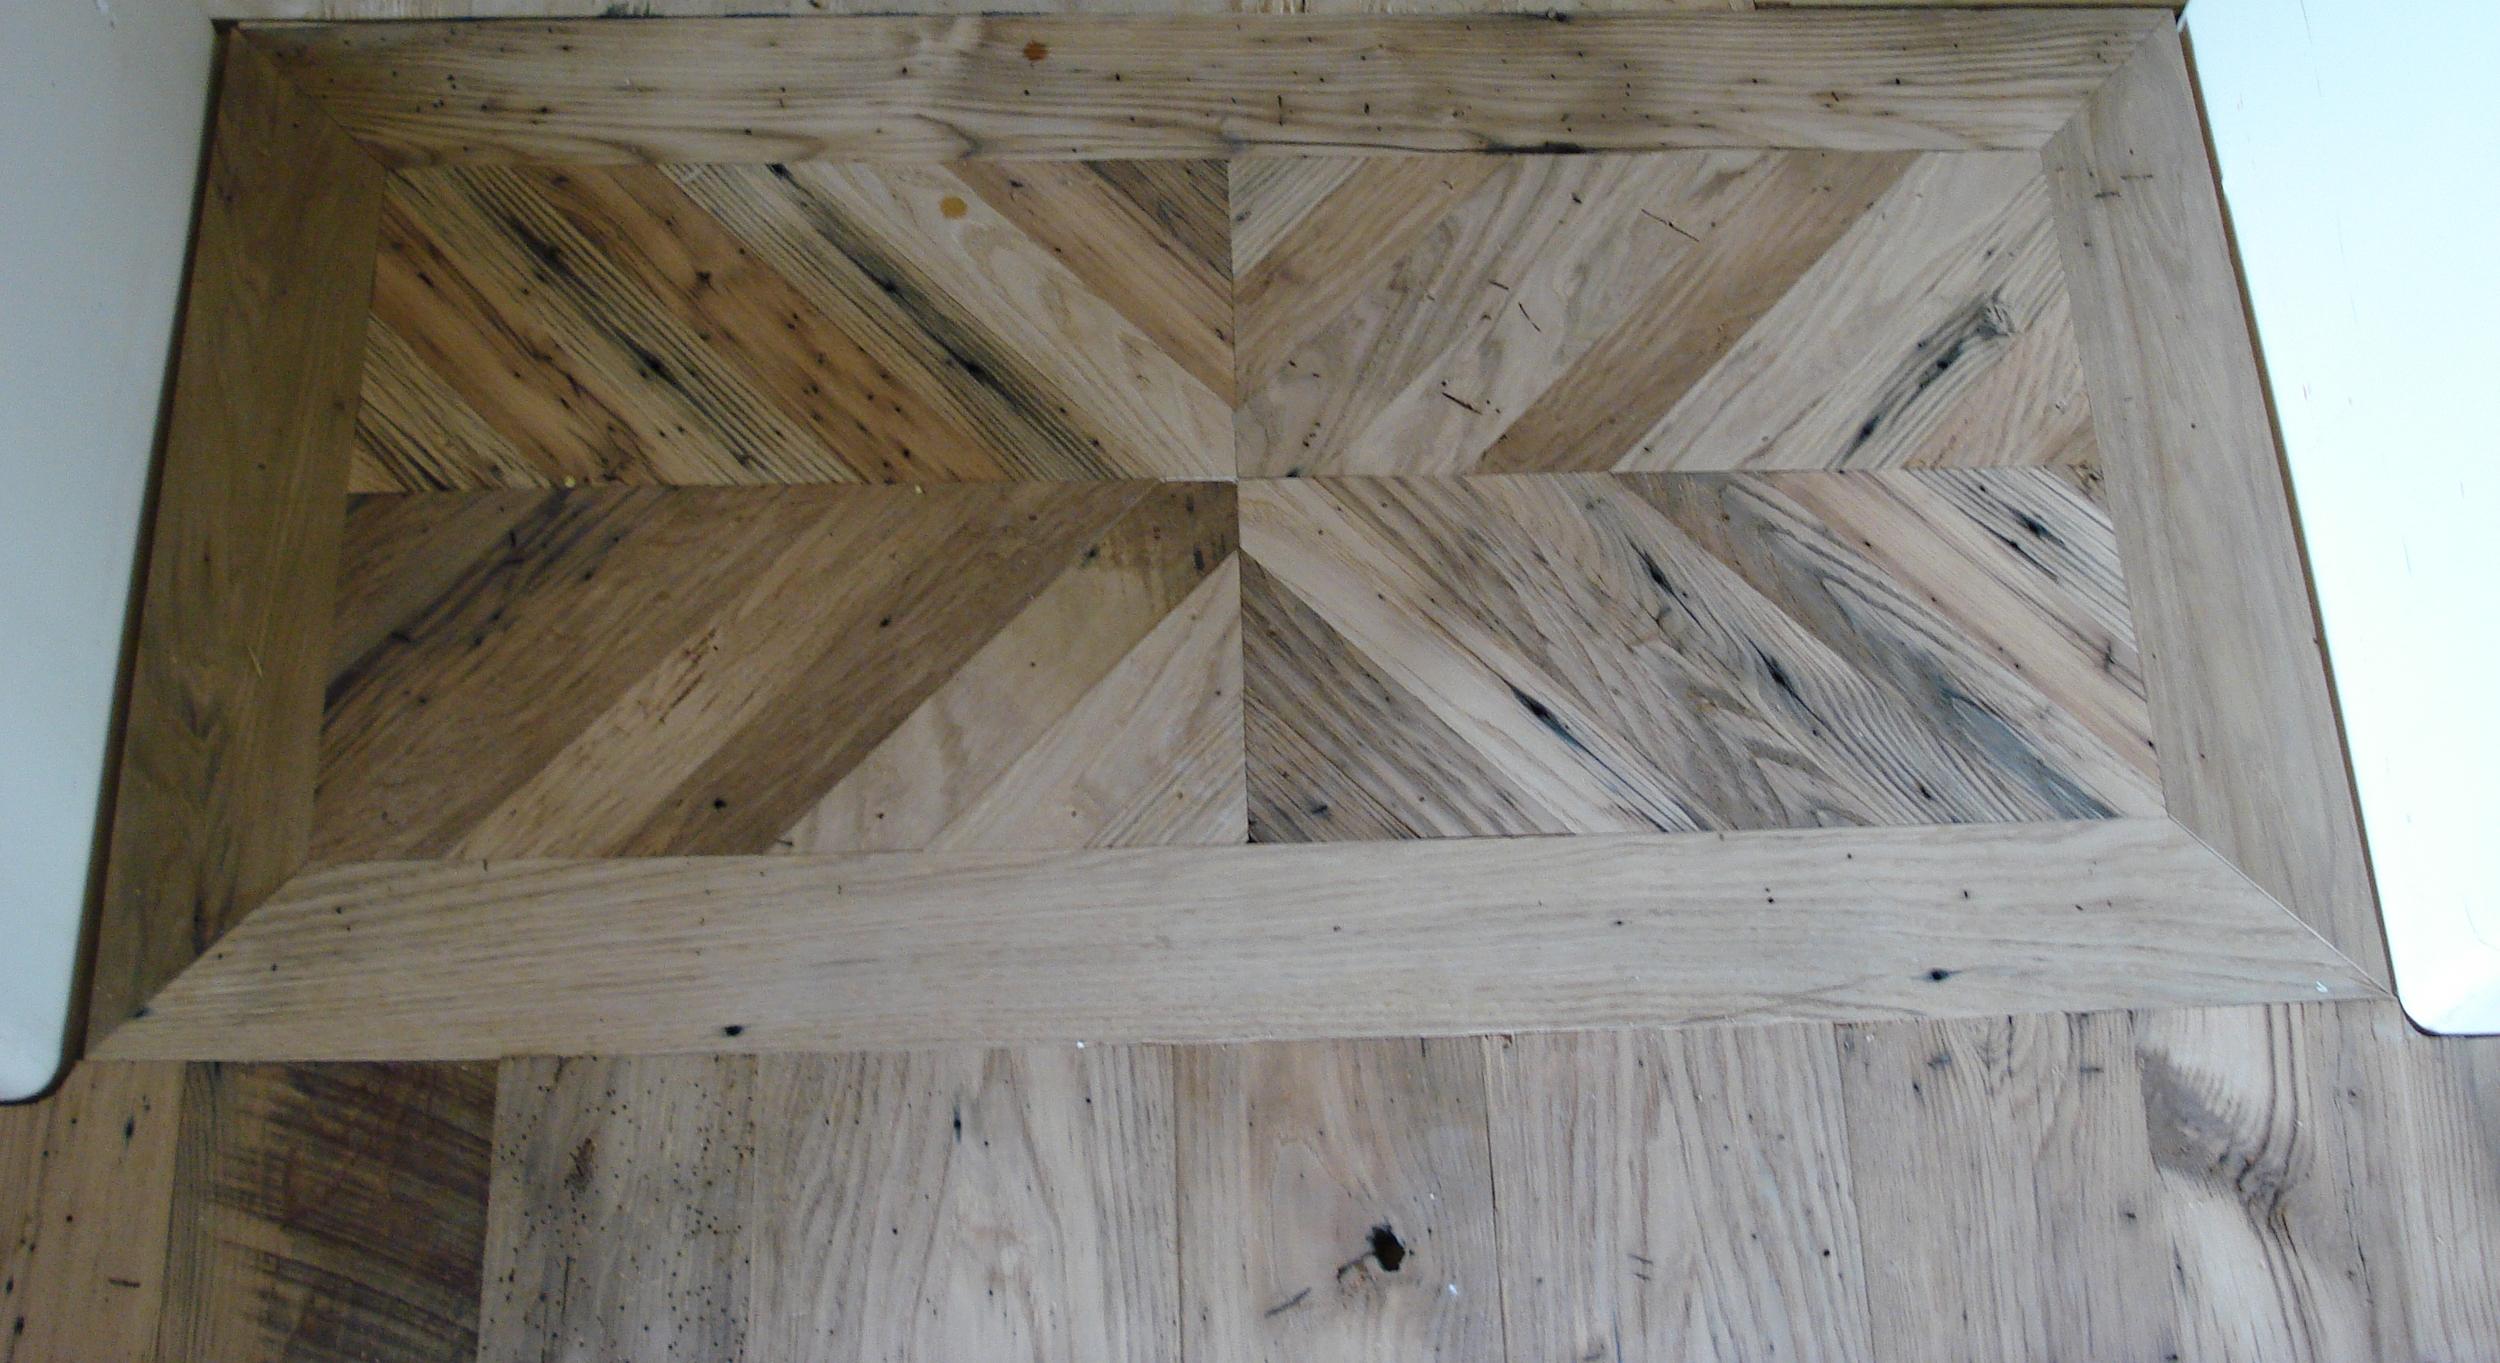 Starburst pattern wood flooring transition